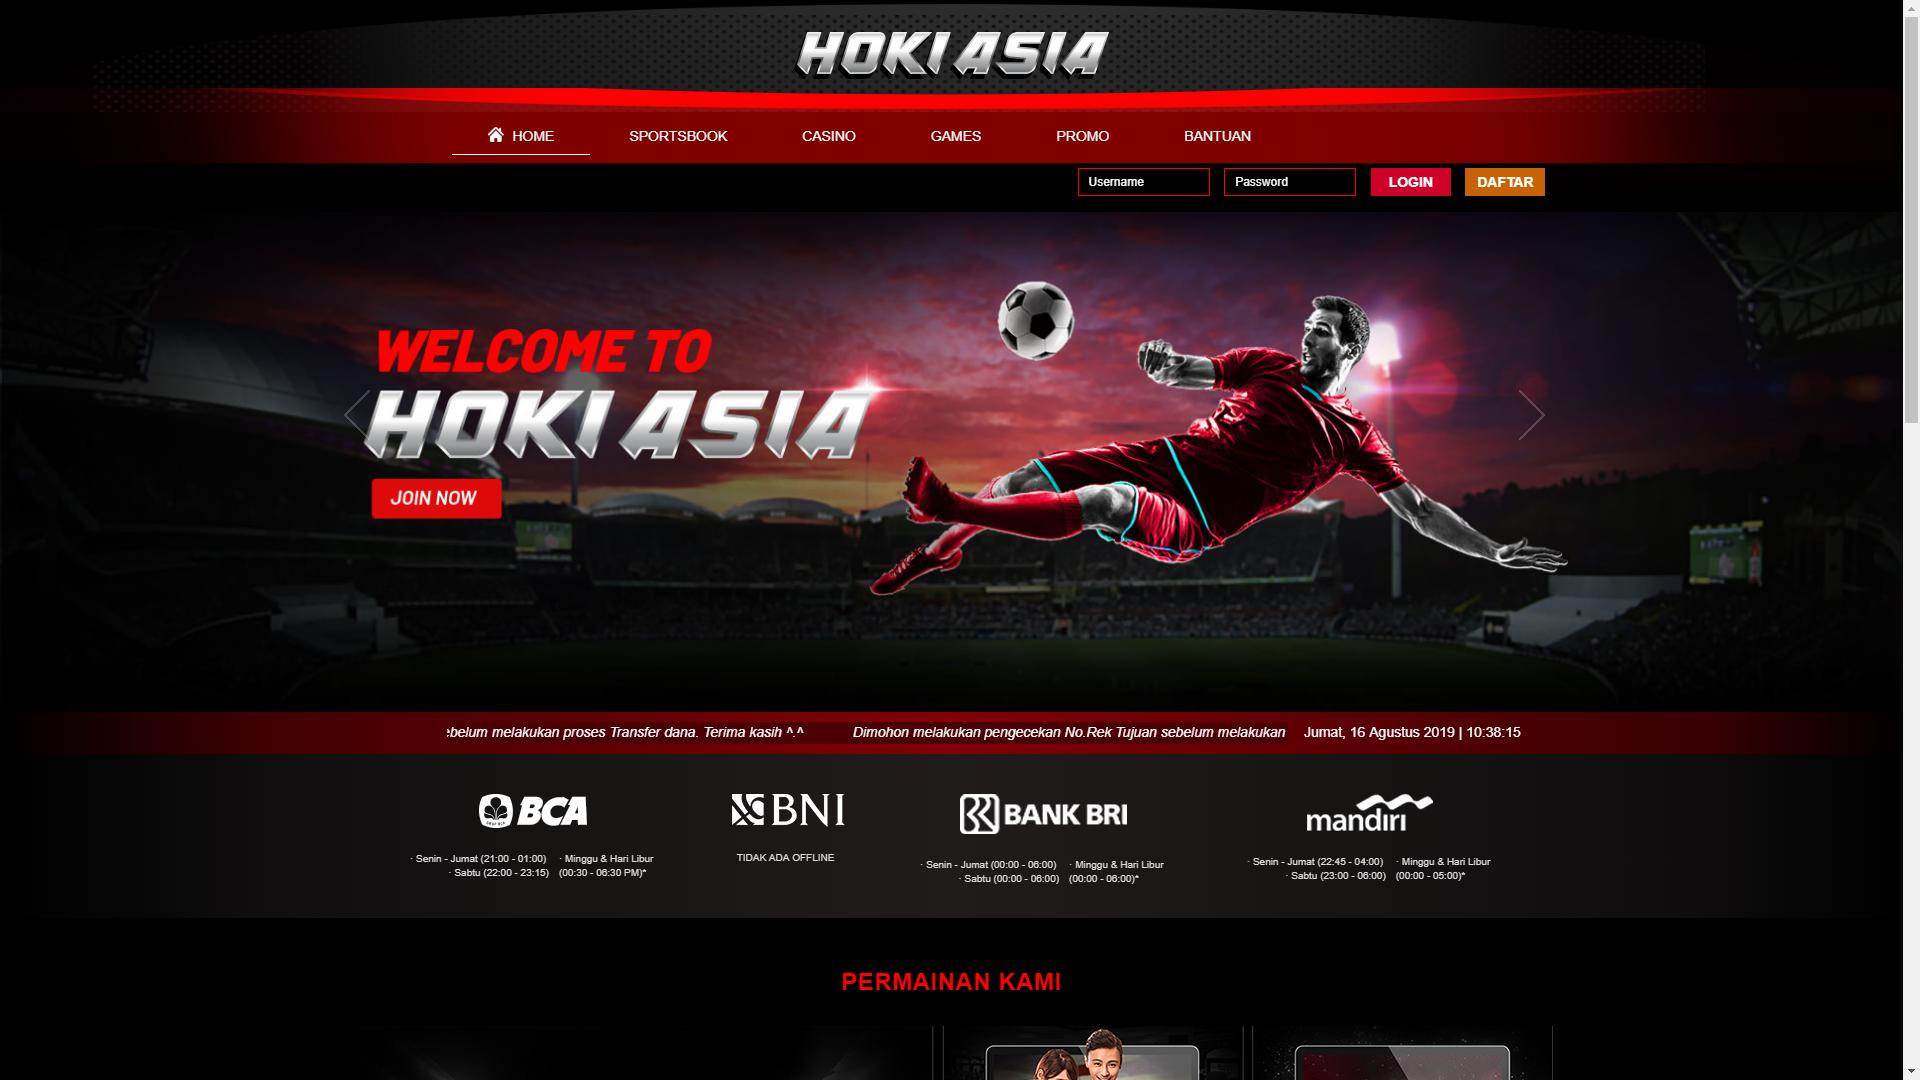 Wallpaper Langsung - Hokiasia - Pc Game - Pc Game , HD Wallpaper & Backgrounds